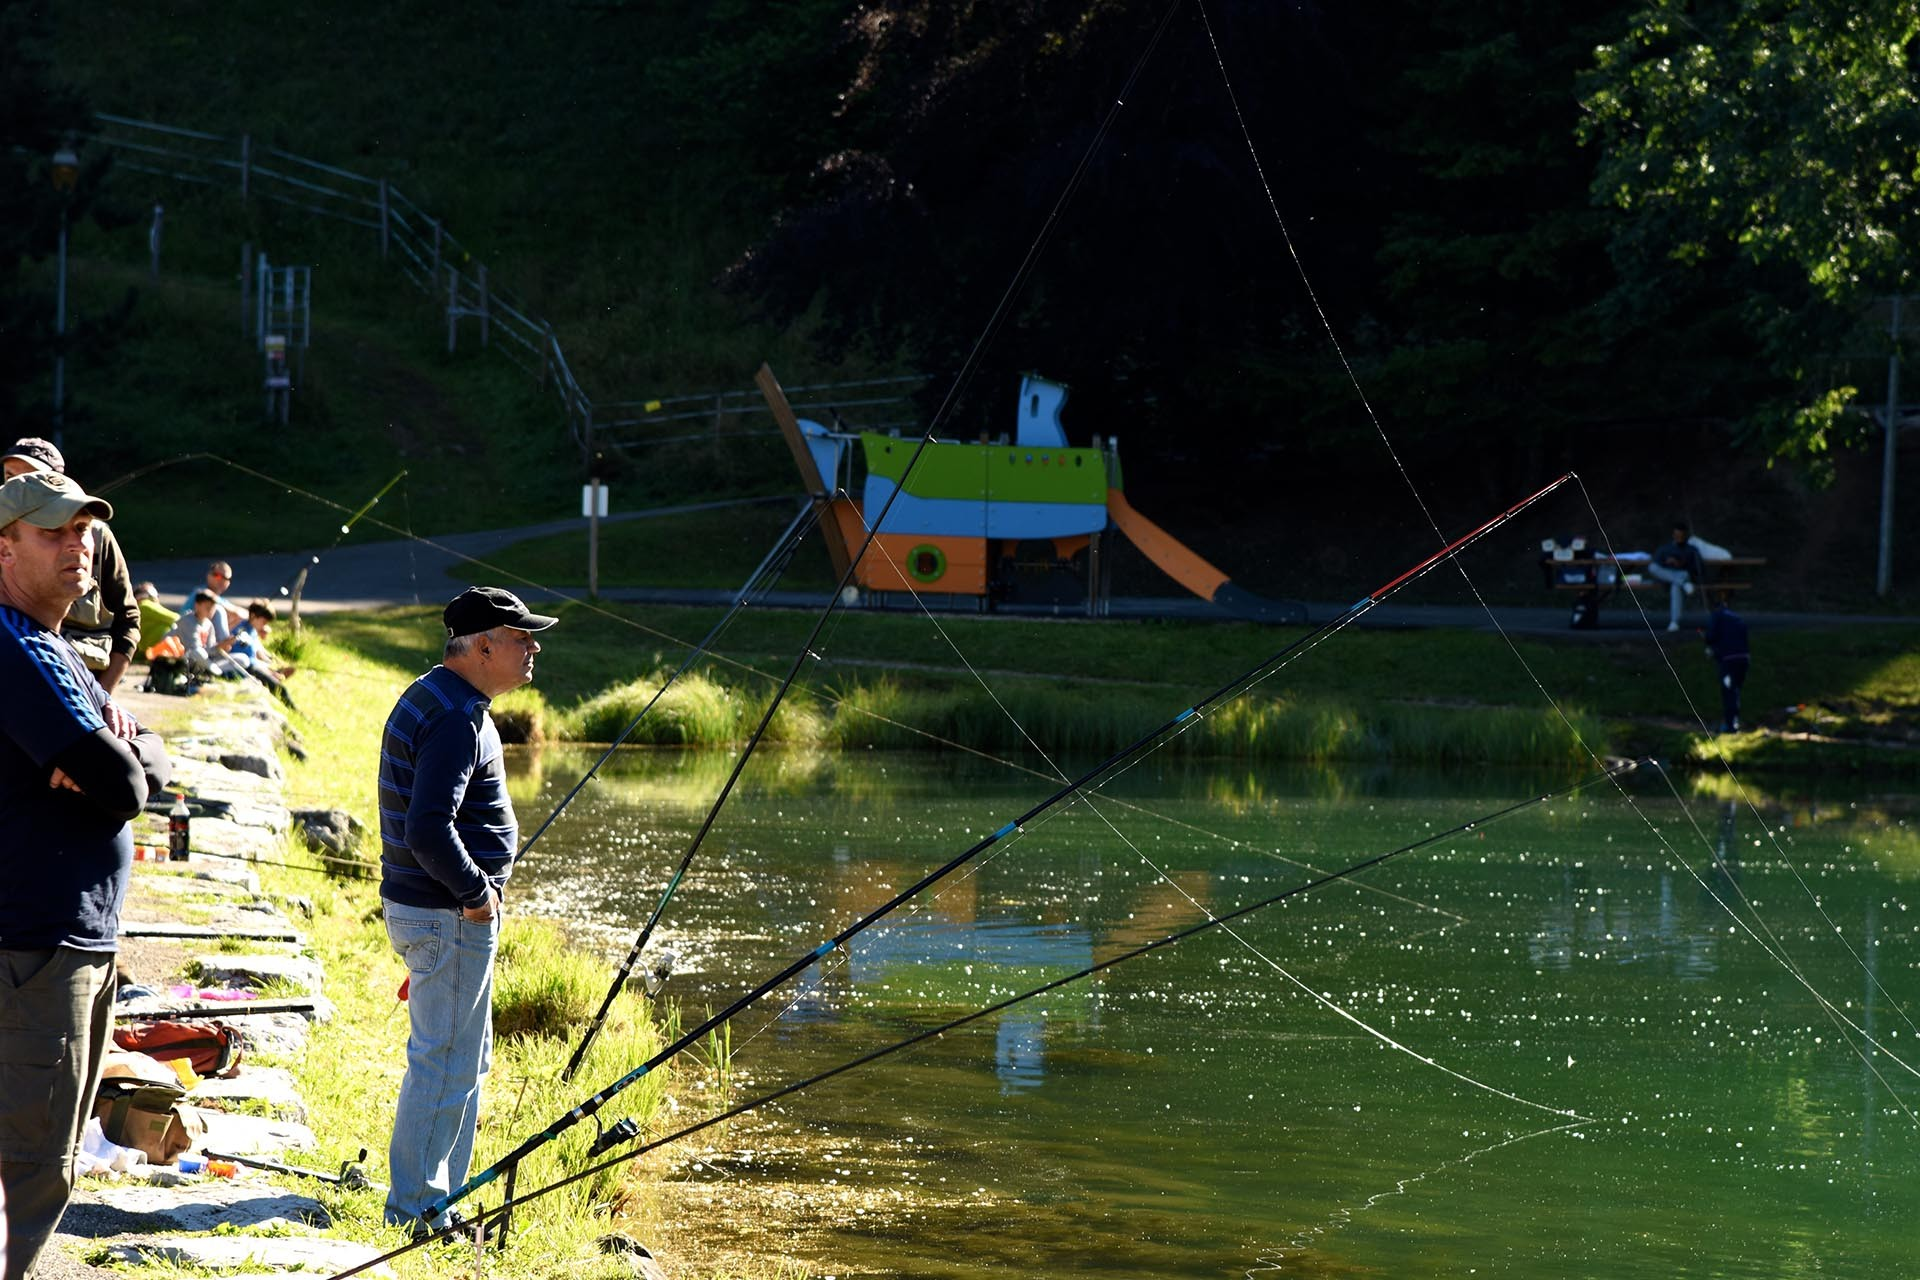 Fishing in lake Vonnes